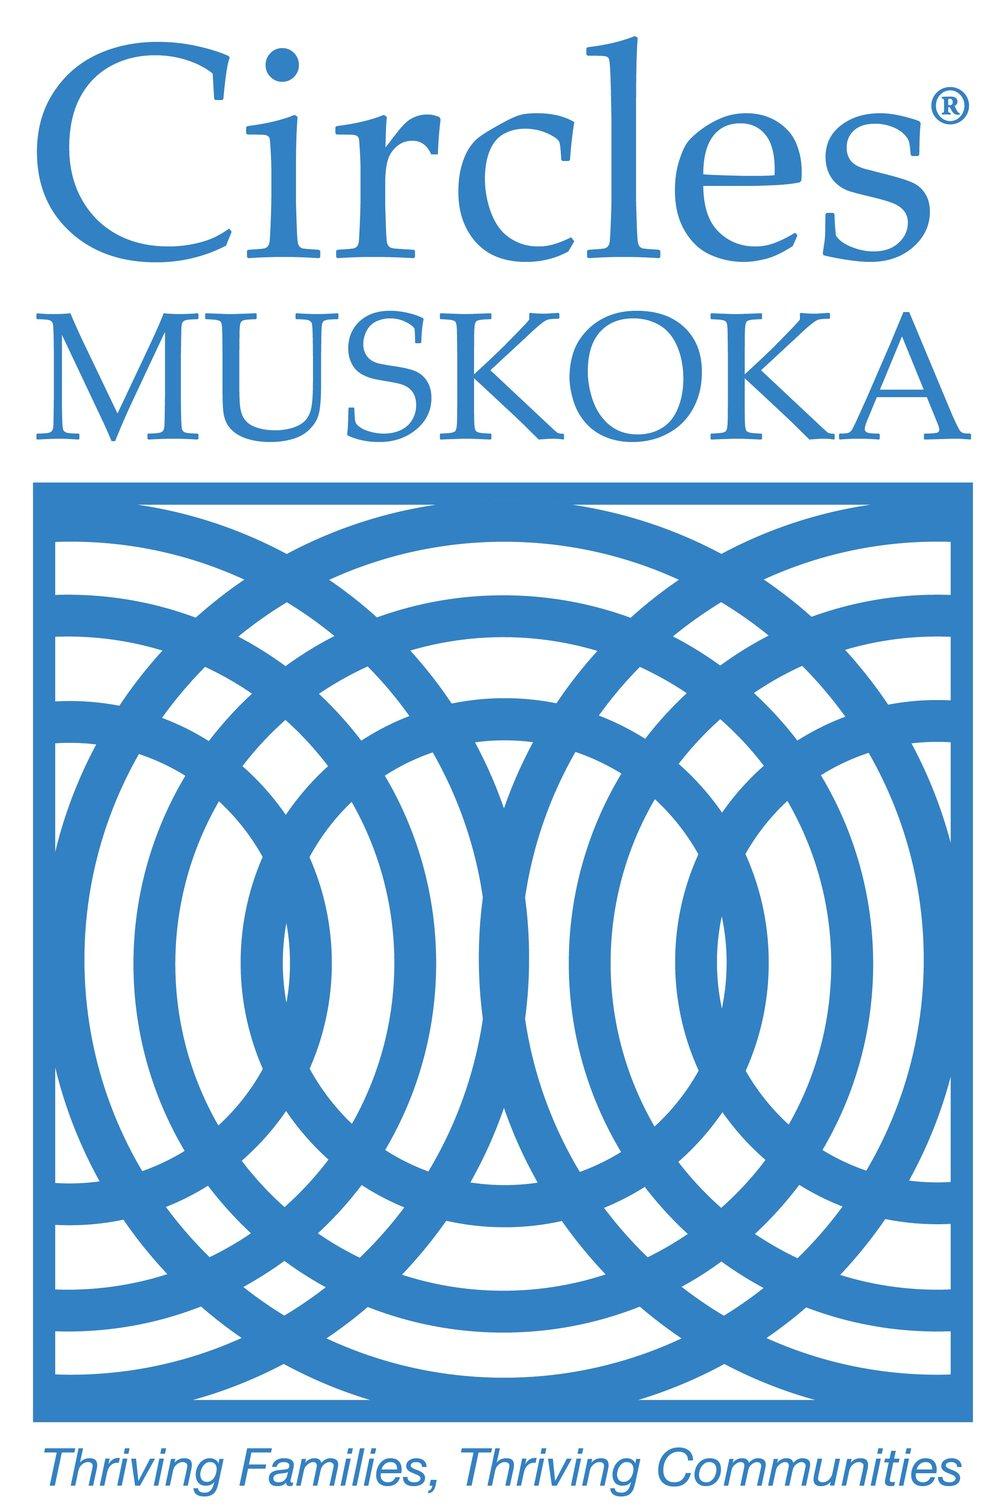 Circles Muskoka vertical logo (2).jpg